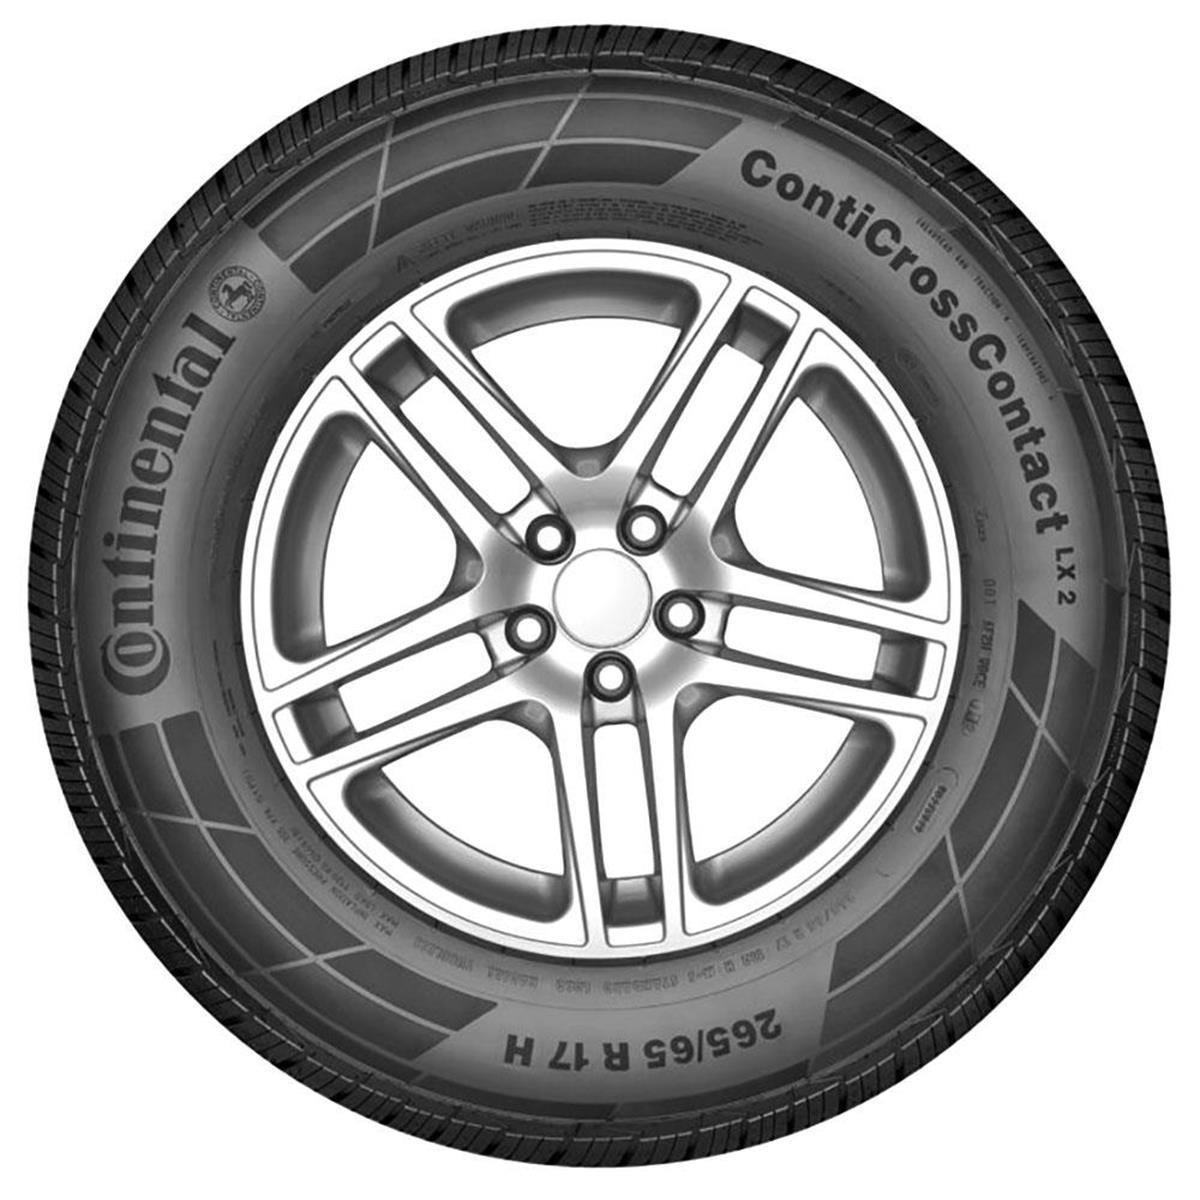 Pneu Continental 265/70R16 112H FR ContiCrossContact LX 2